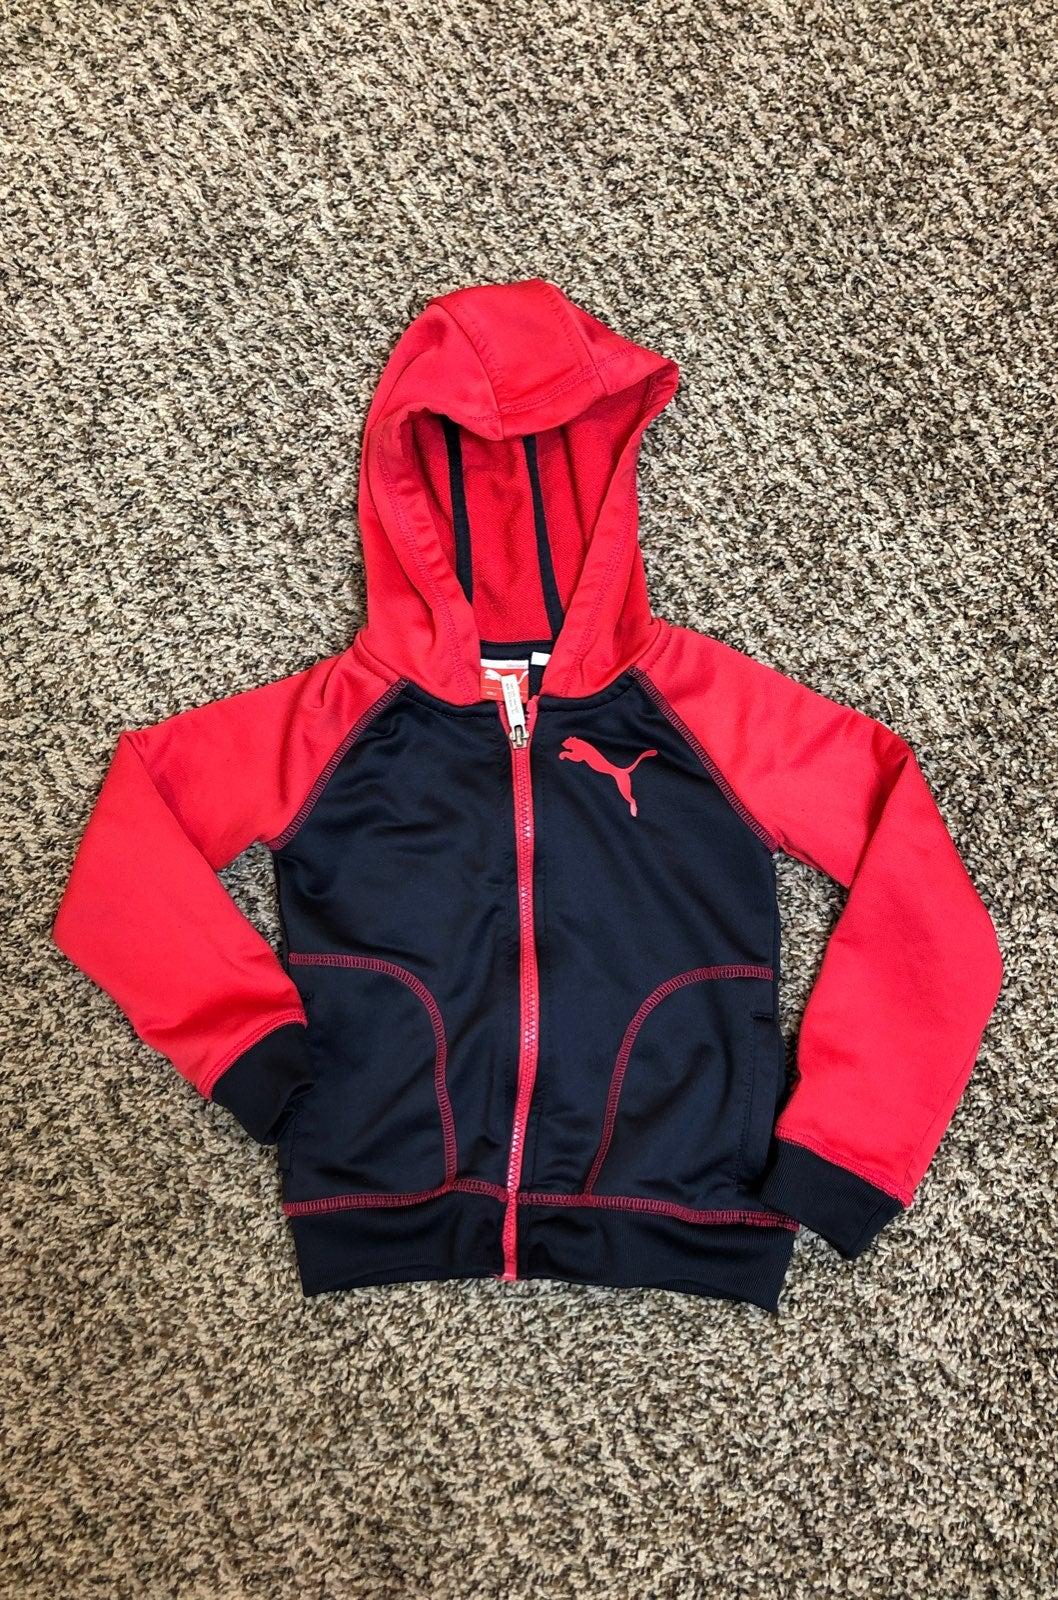 Girls Puma Jacket